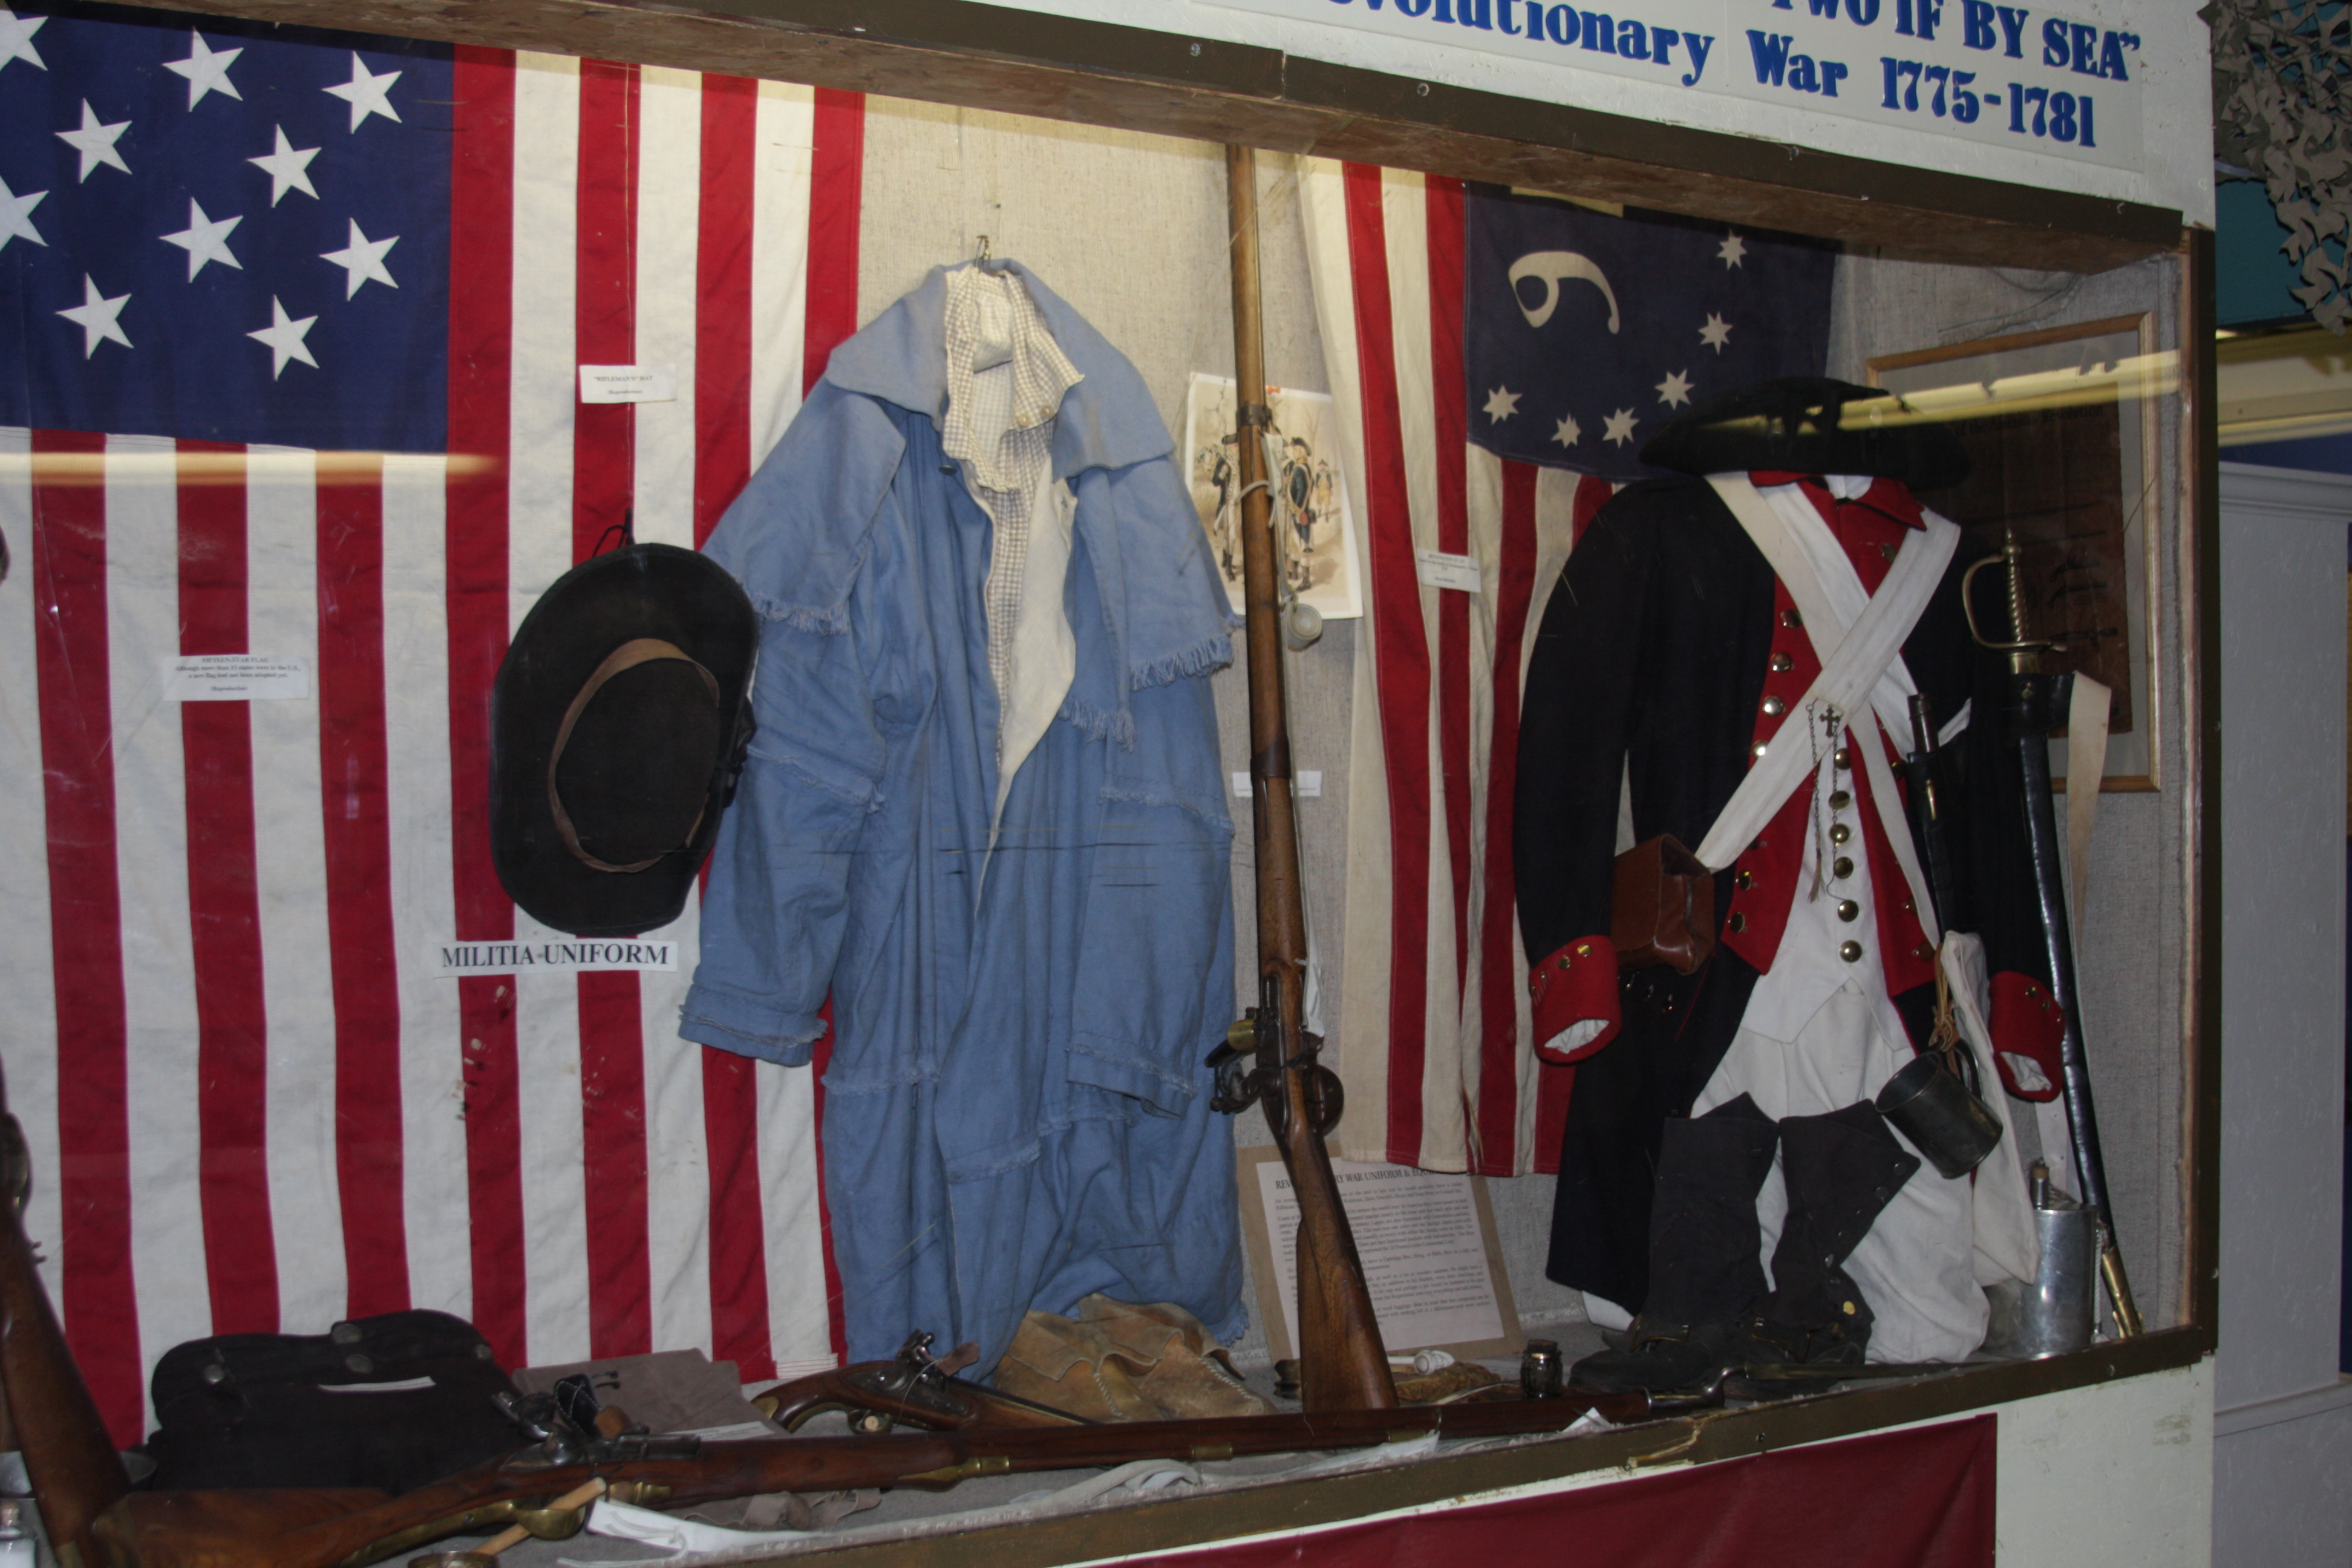 The Revolutionary War Display